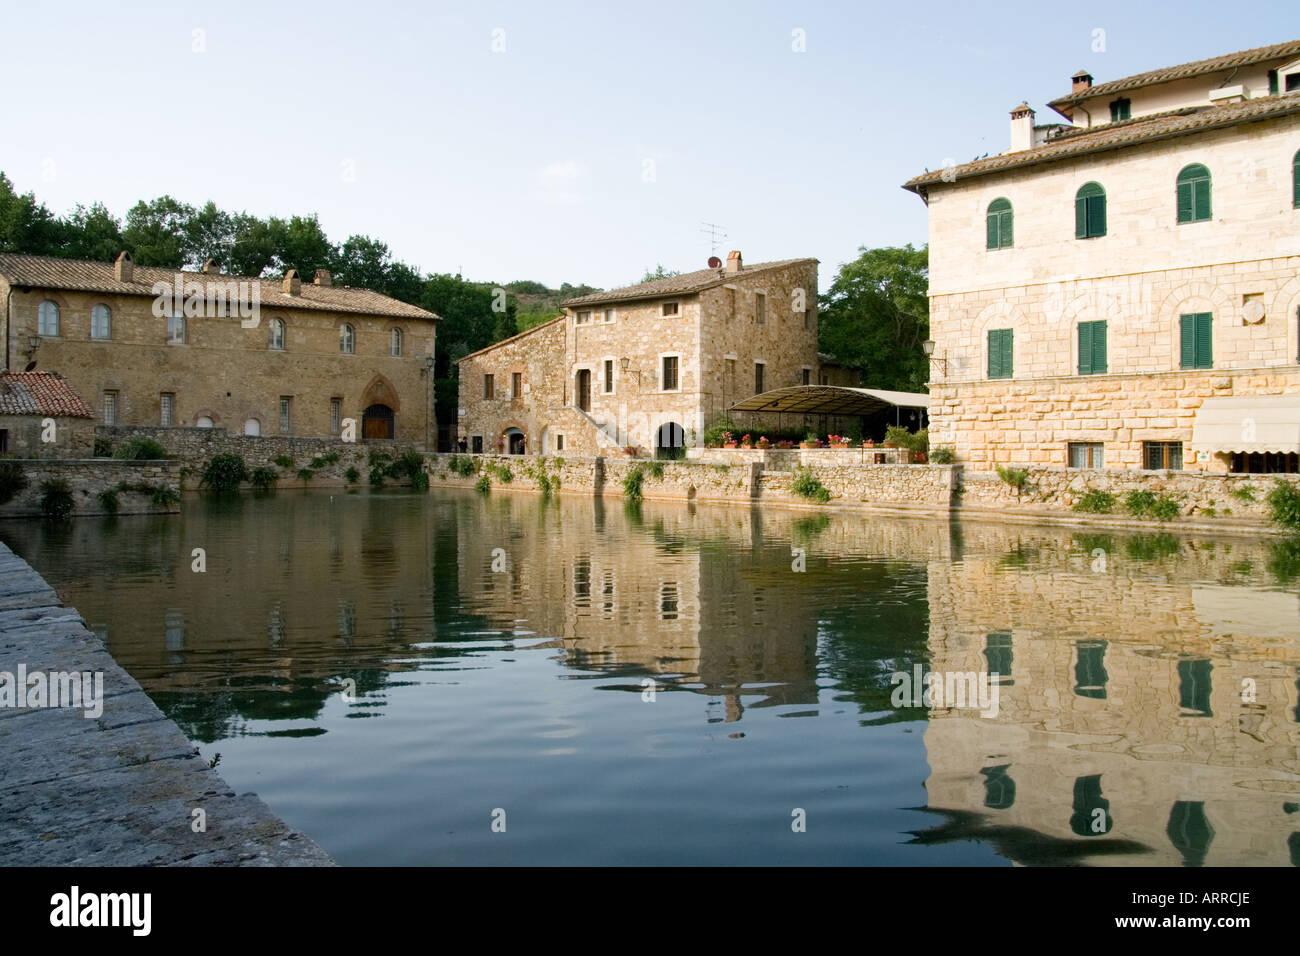 Bagno vignoni toskana italien der renaissance piscina heißen quellen